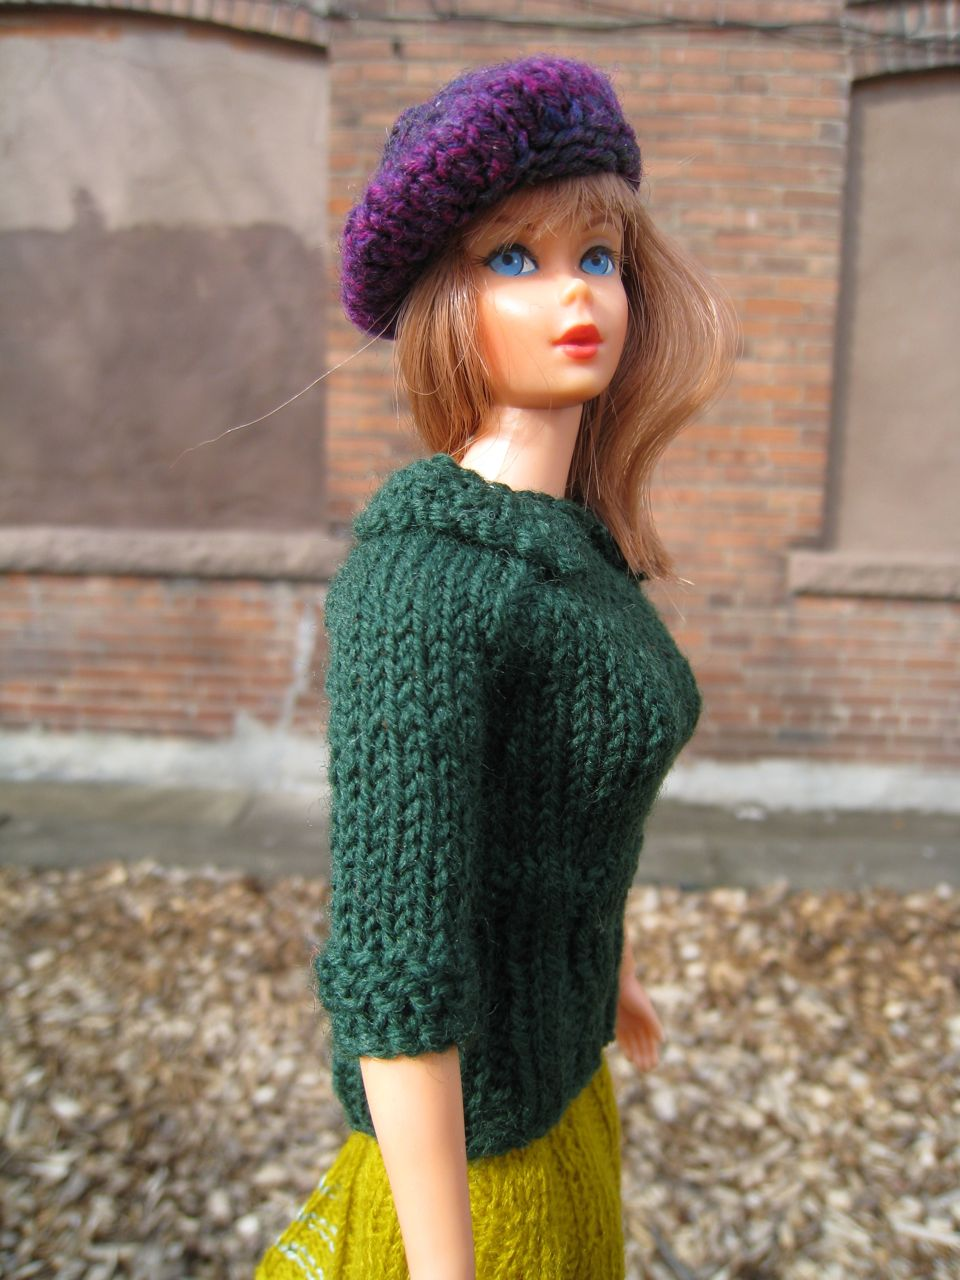 Best Barbie Knits: New Barbie Knitting Pattern